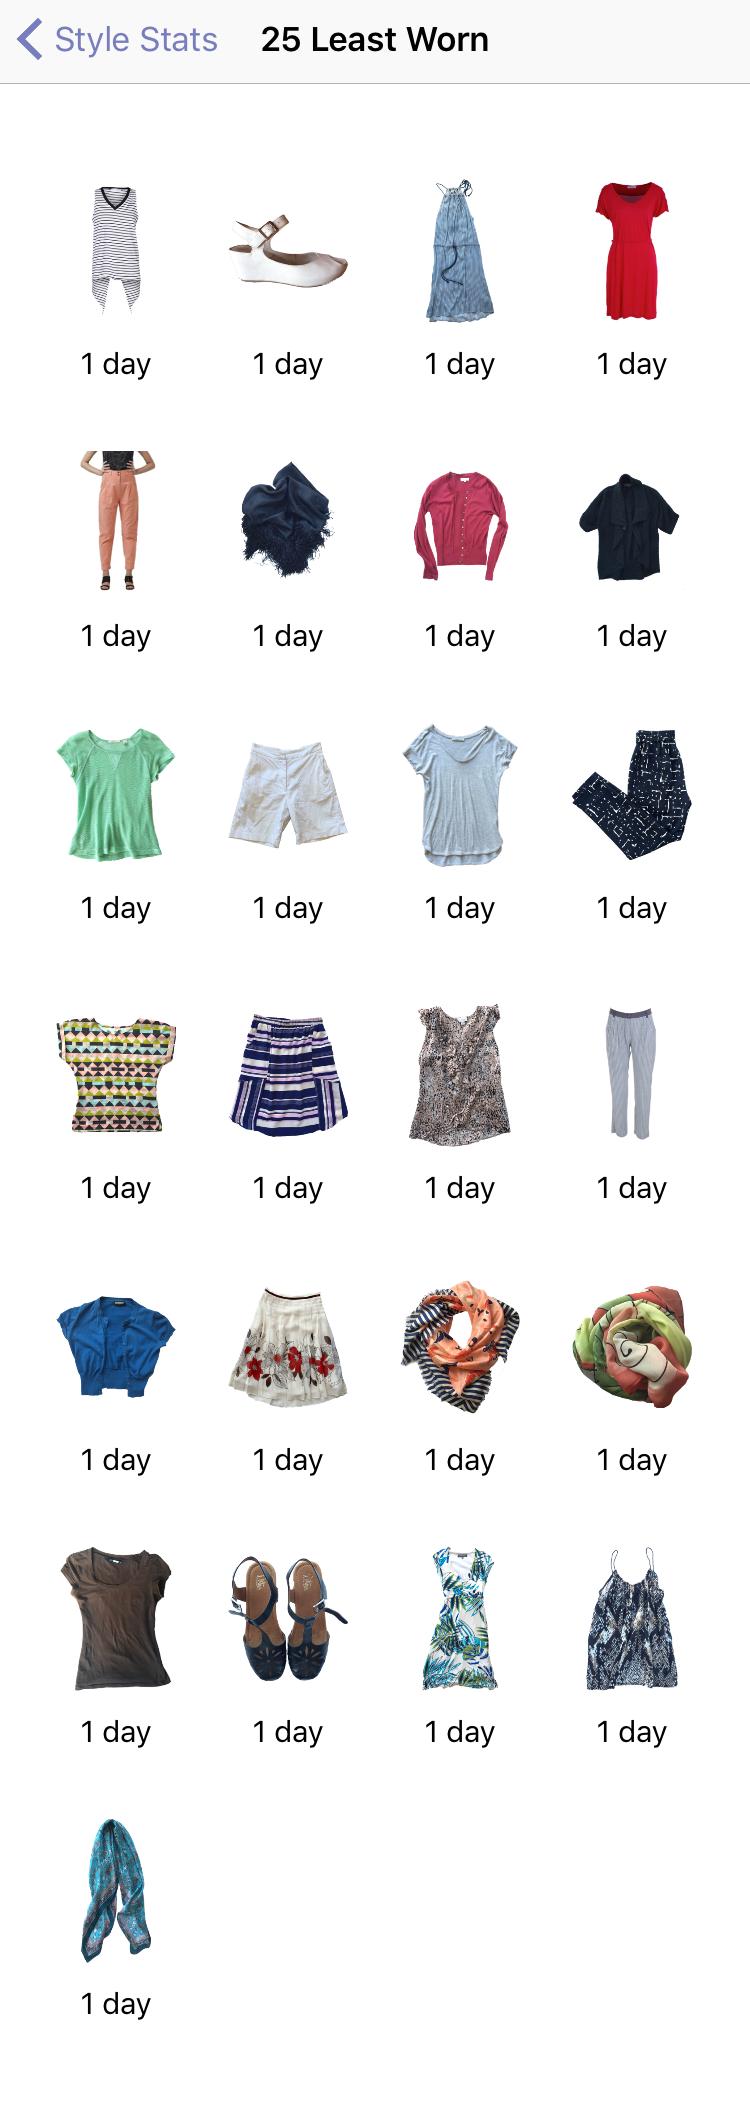 Least worn items